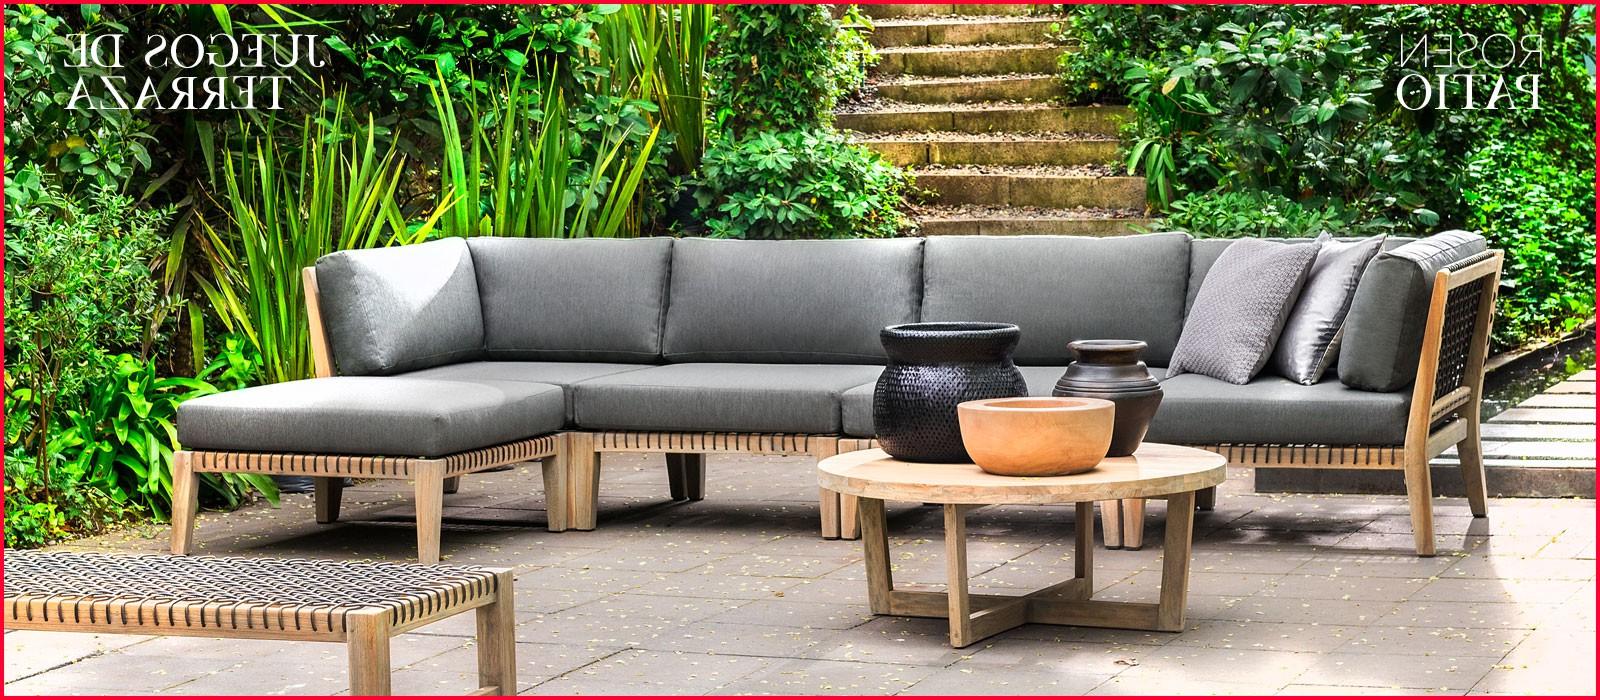 Sofas De Jardin Baratos Dwdk sofas De Jardin Baratos Muebles De Terraza Decoracià N